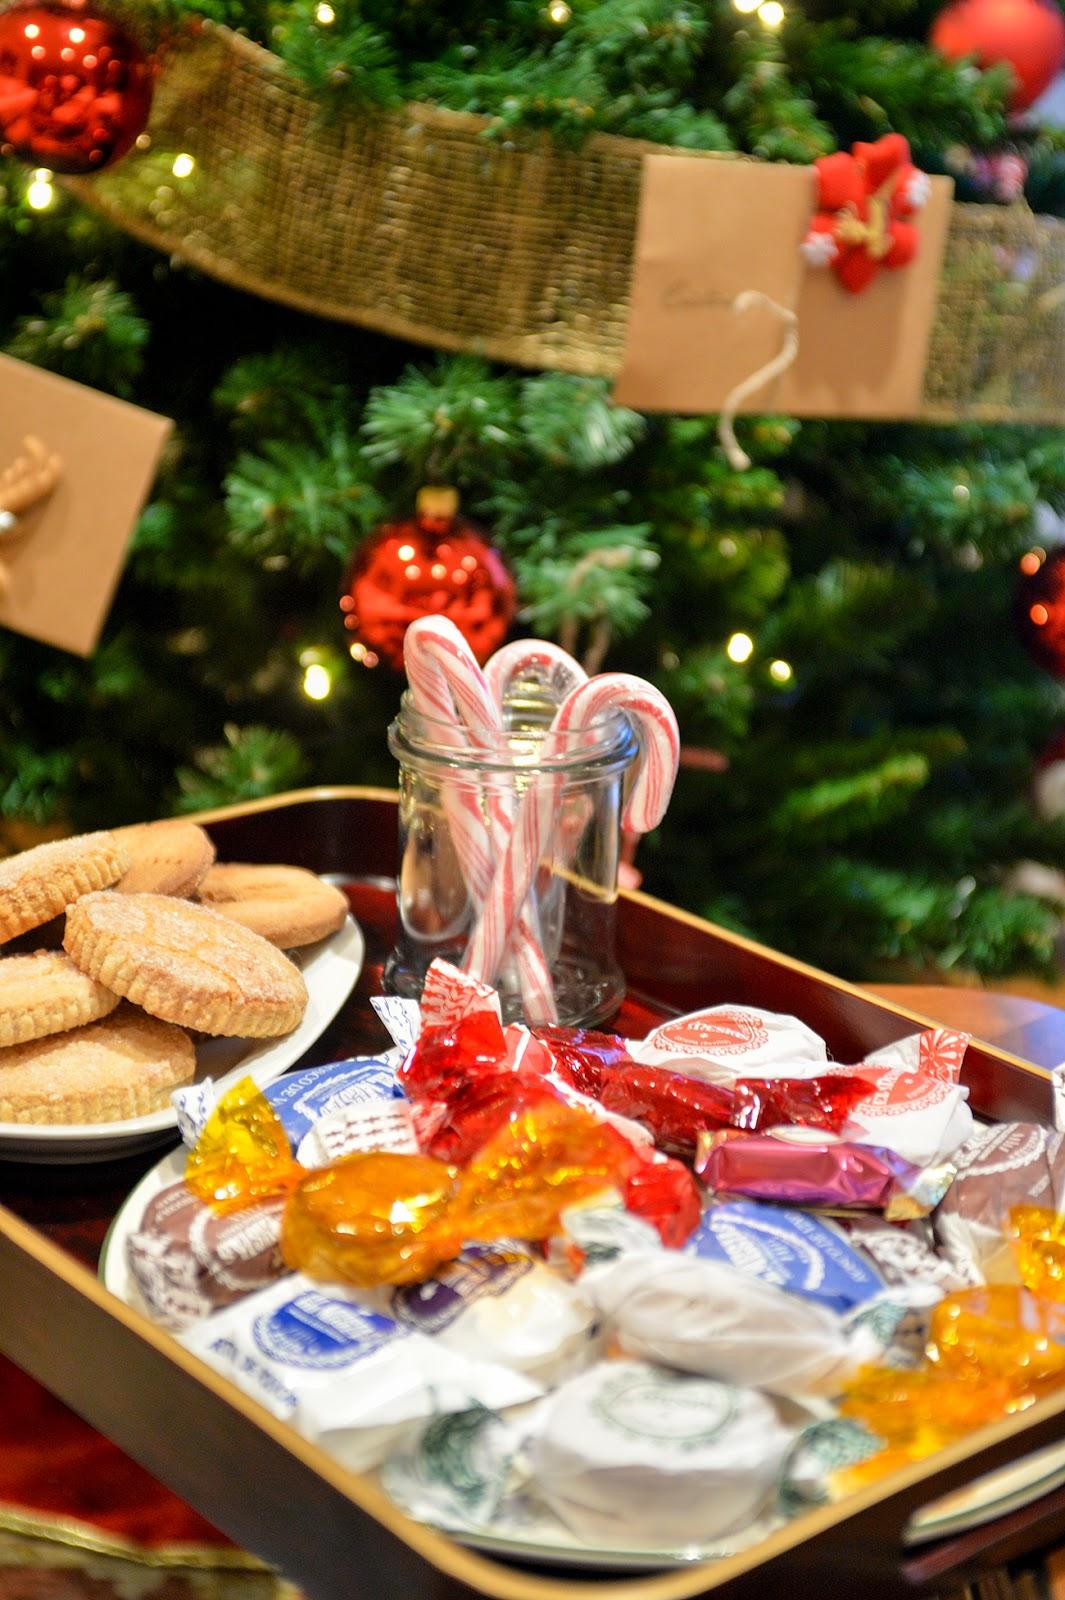 Christmas decor sweets dulces Navidad decoracion